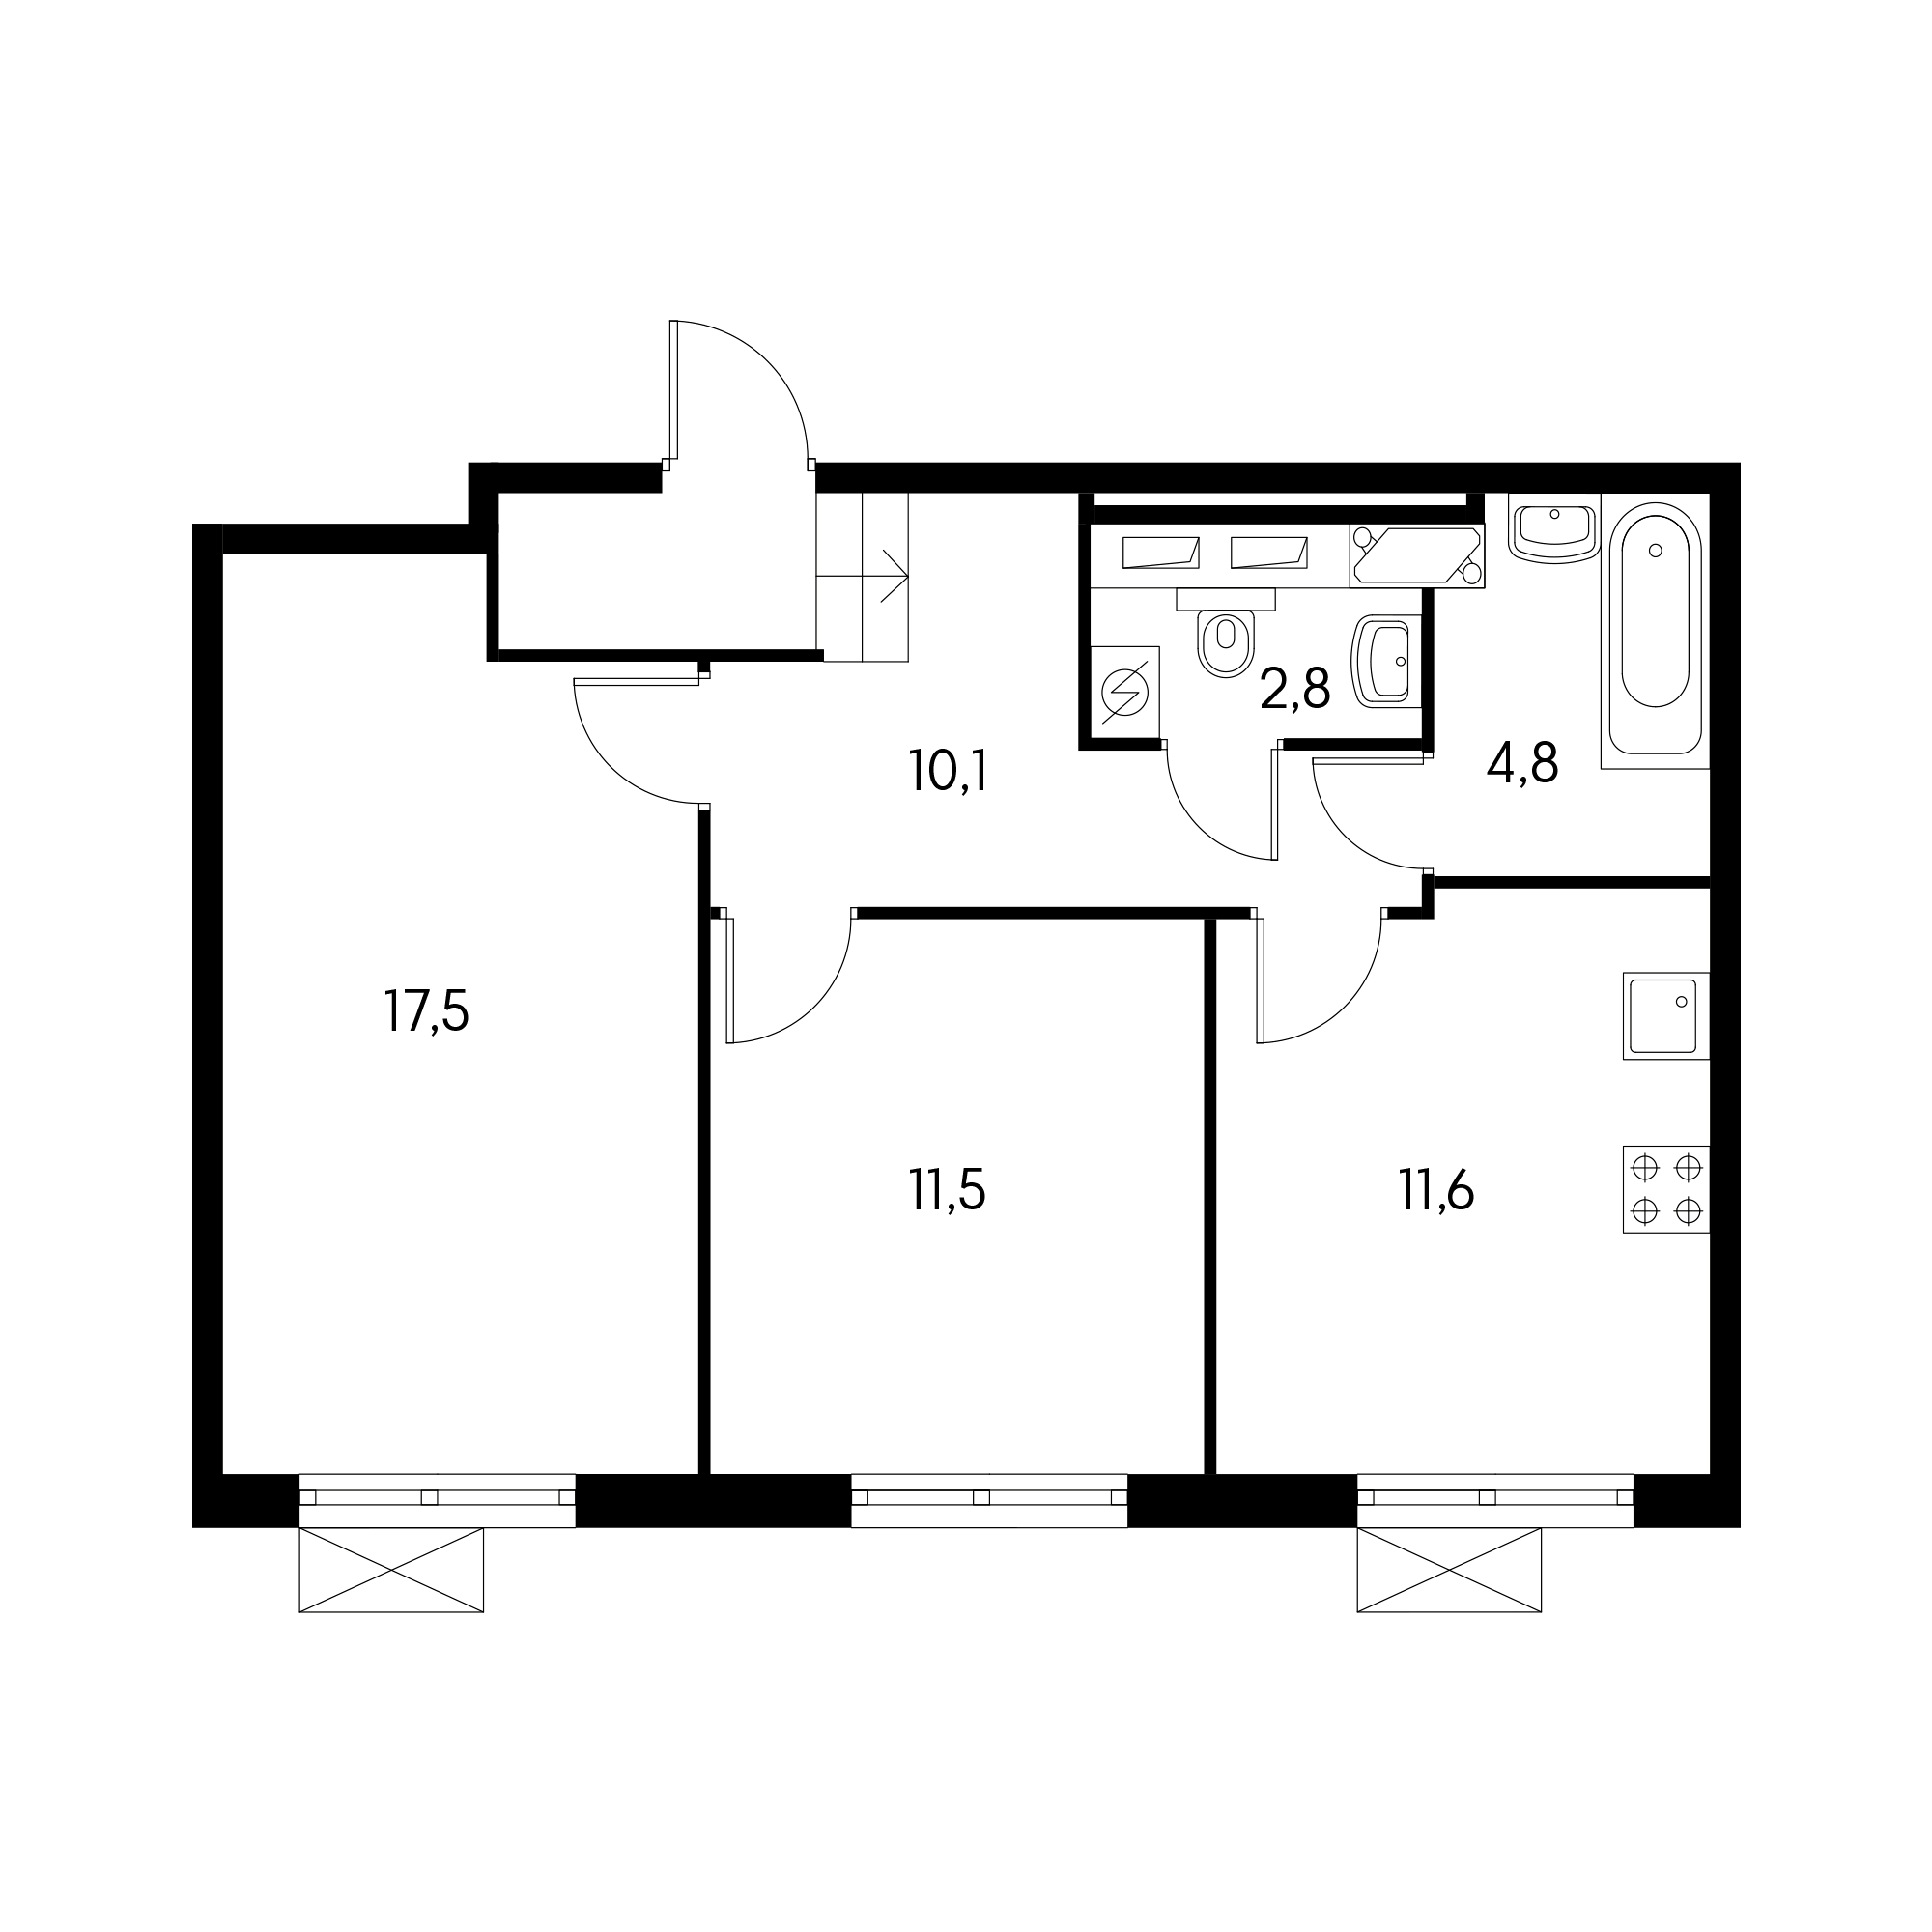 2-1_1(2)